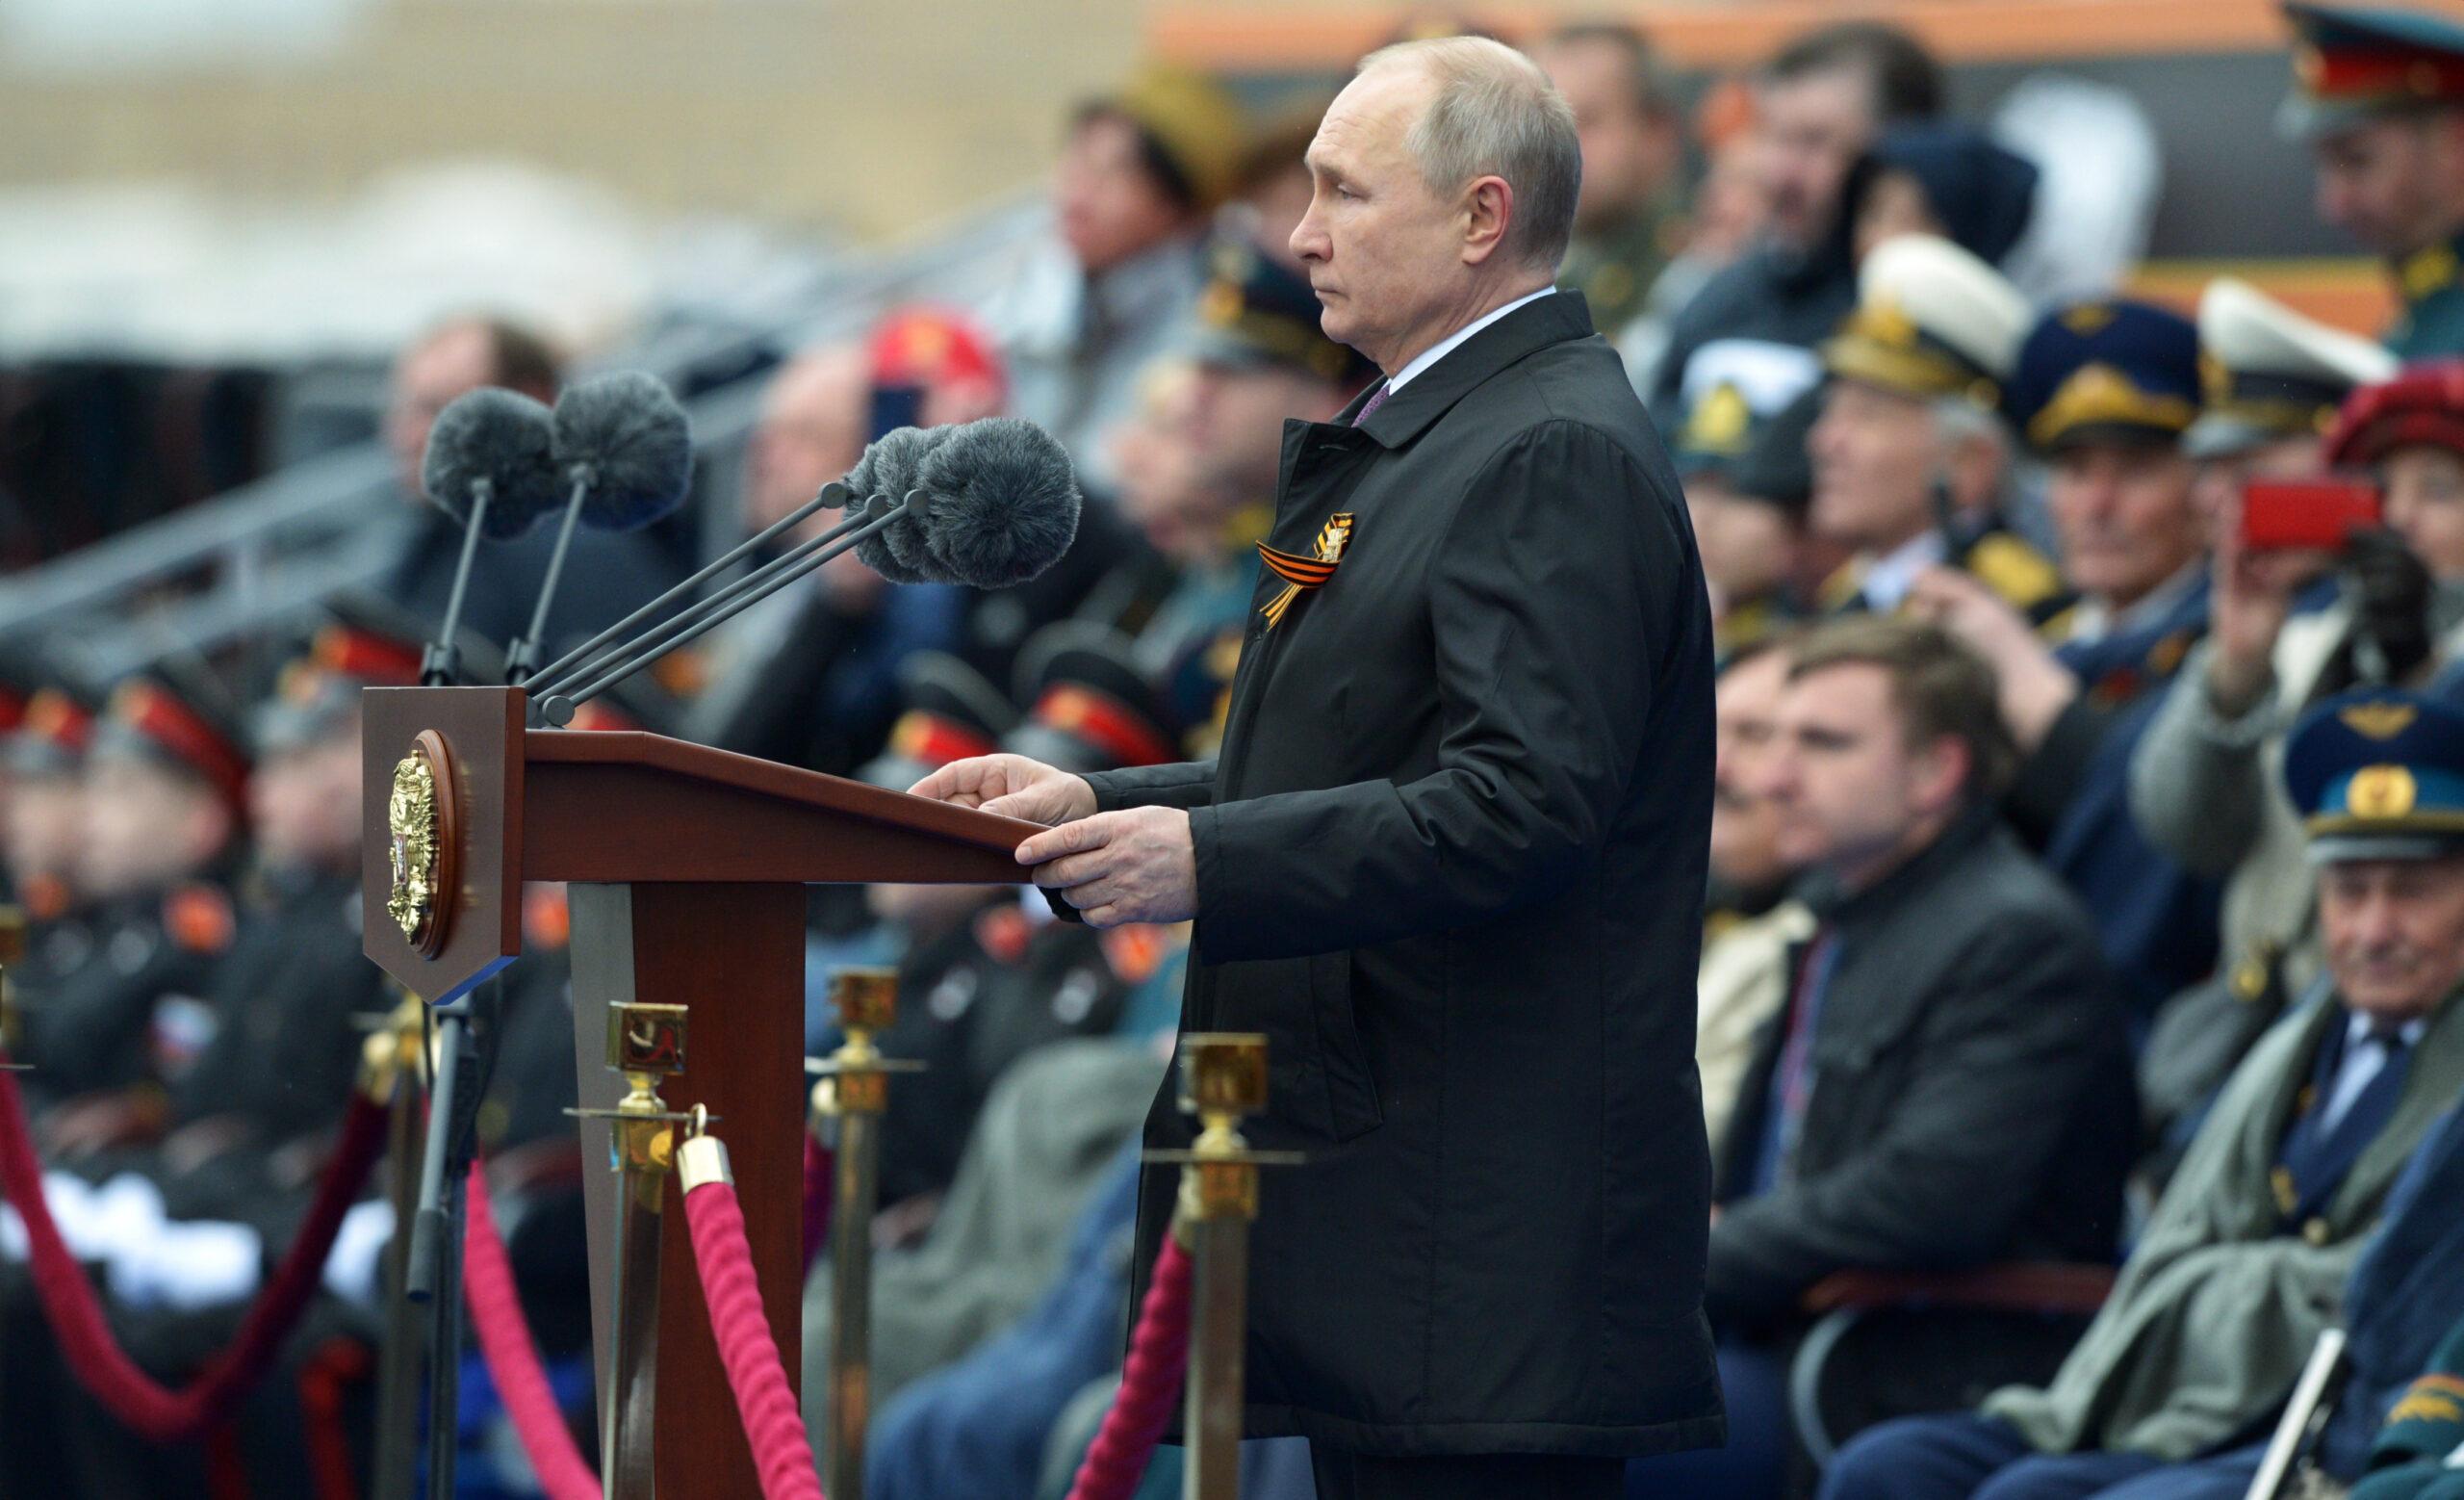 putin parata militare russia